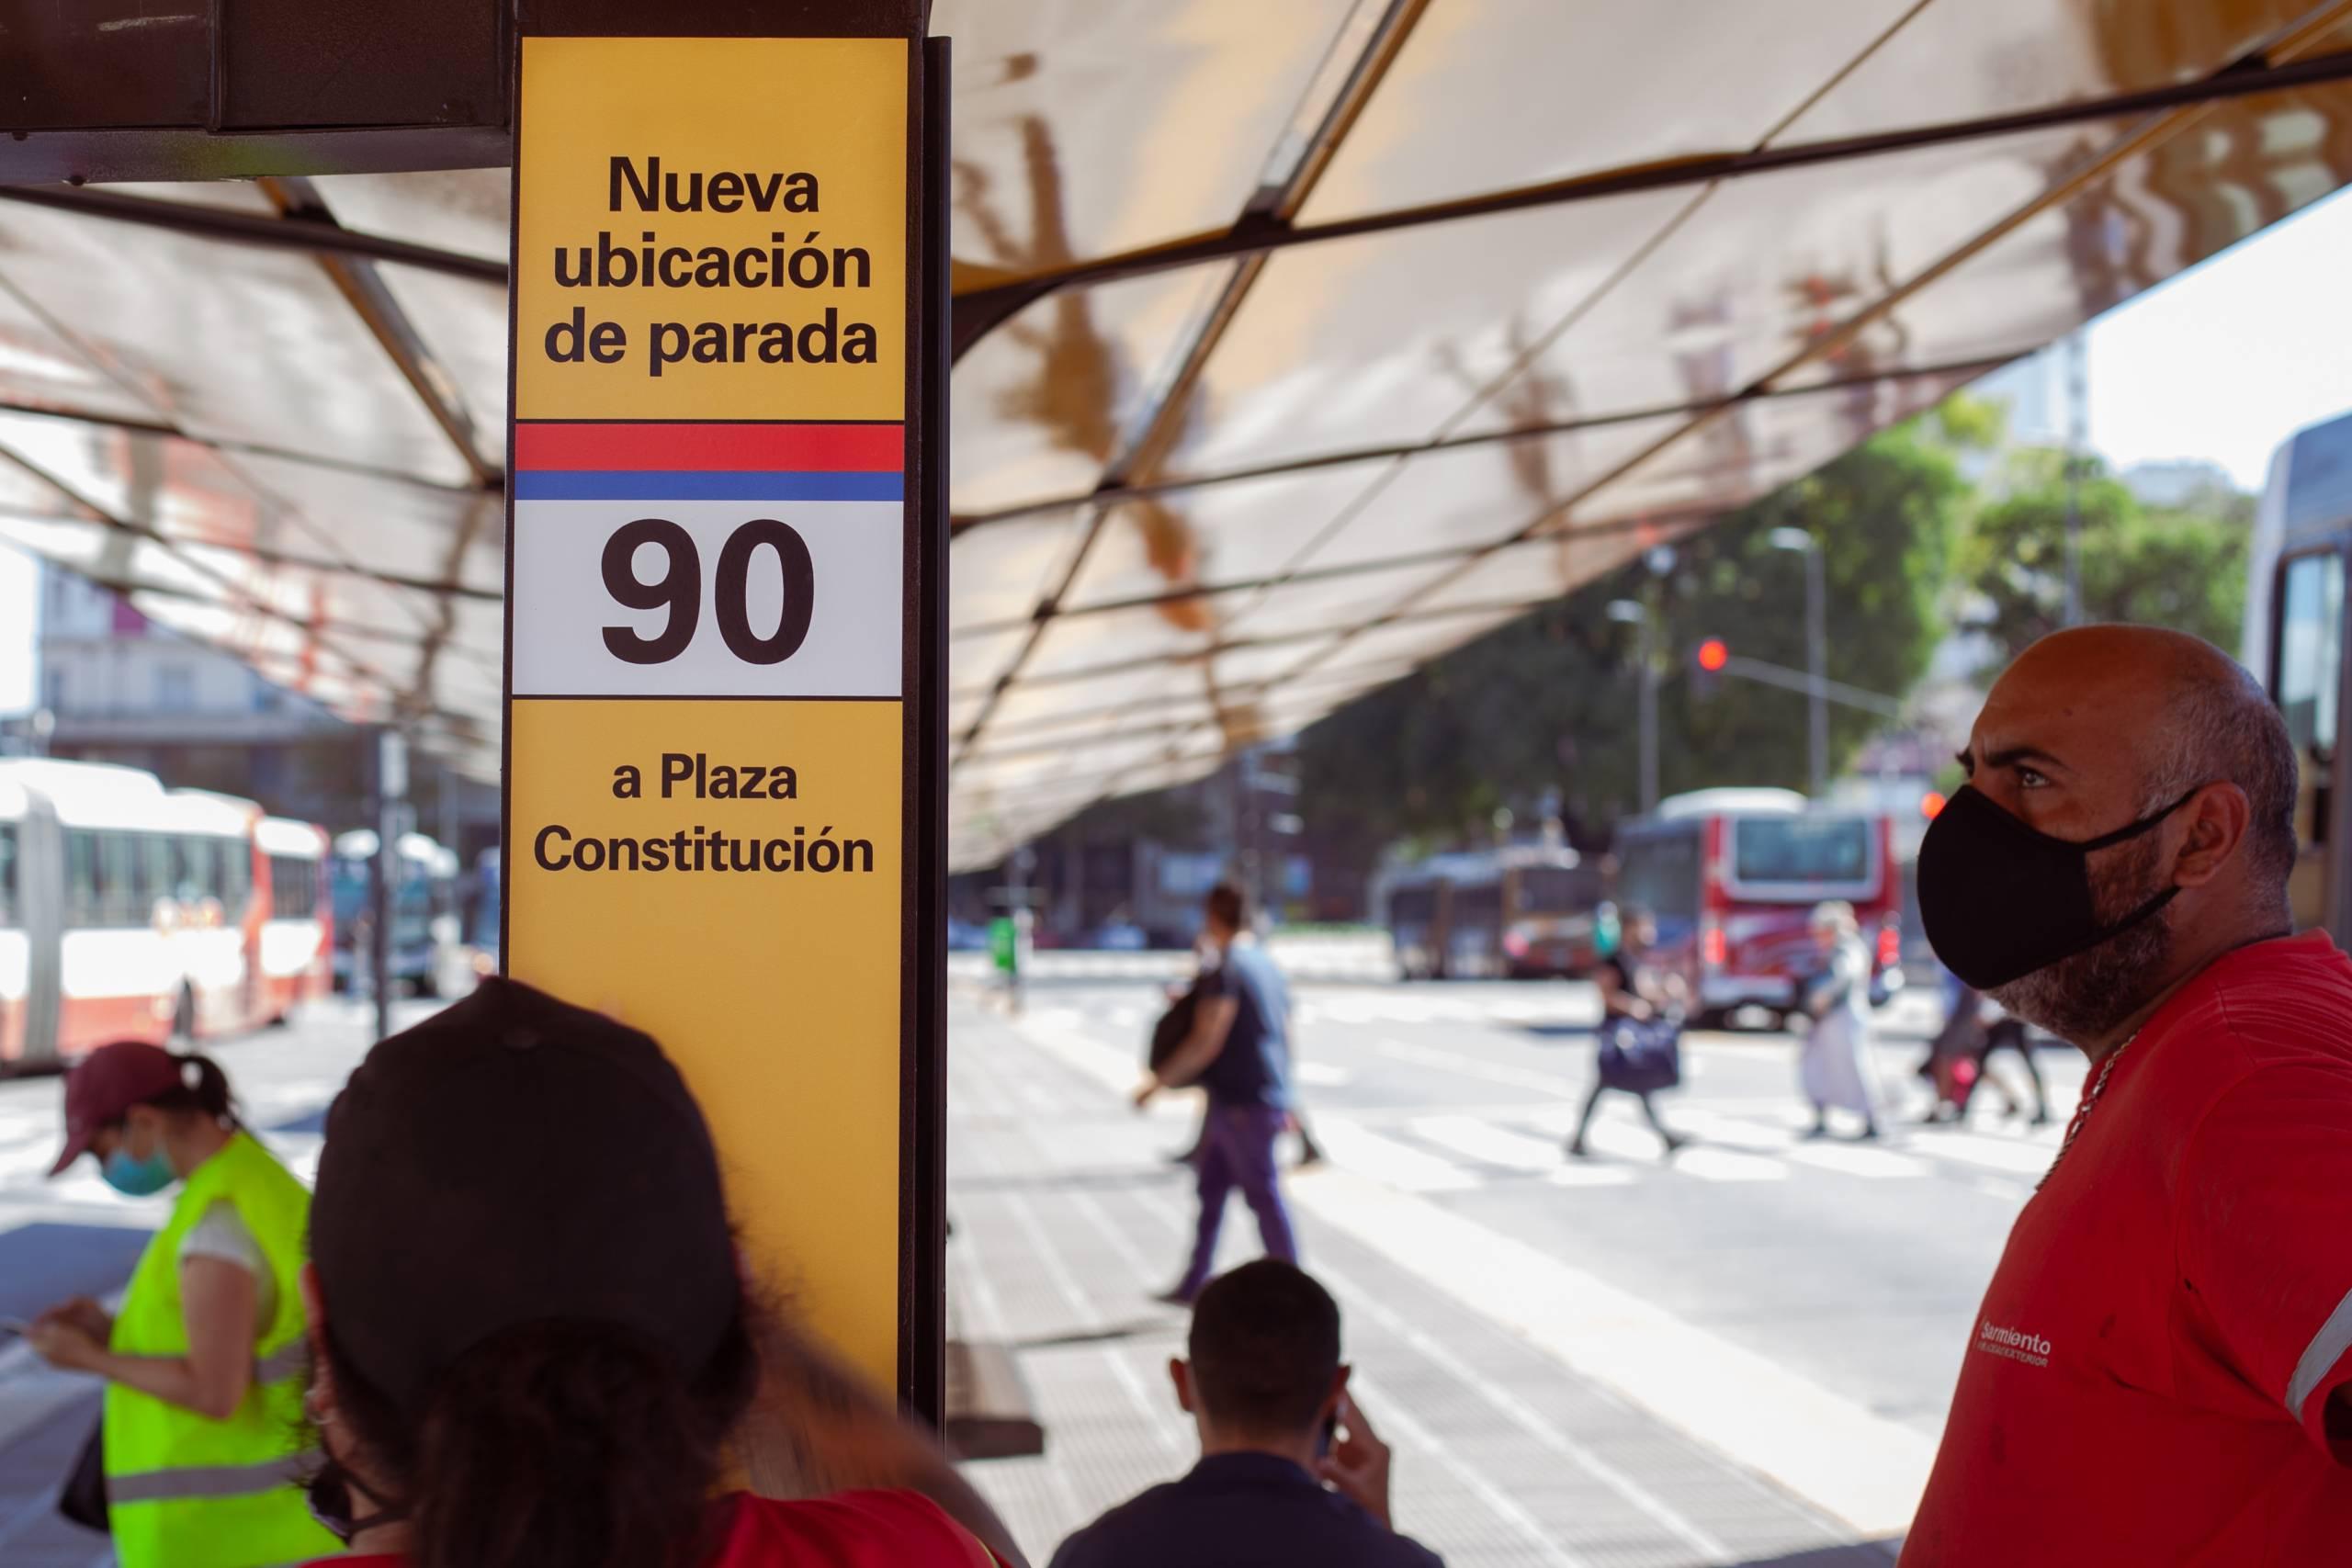 constitucion-redistribucion-de-paradas-Linea-90-1-1